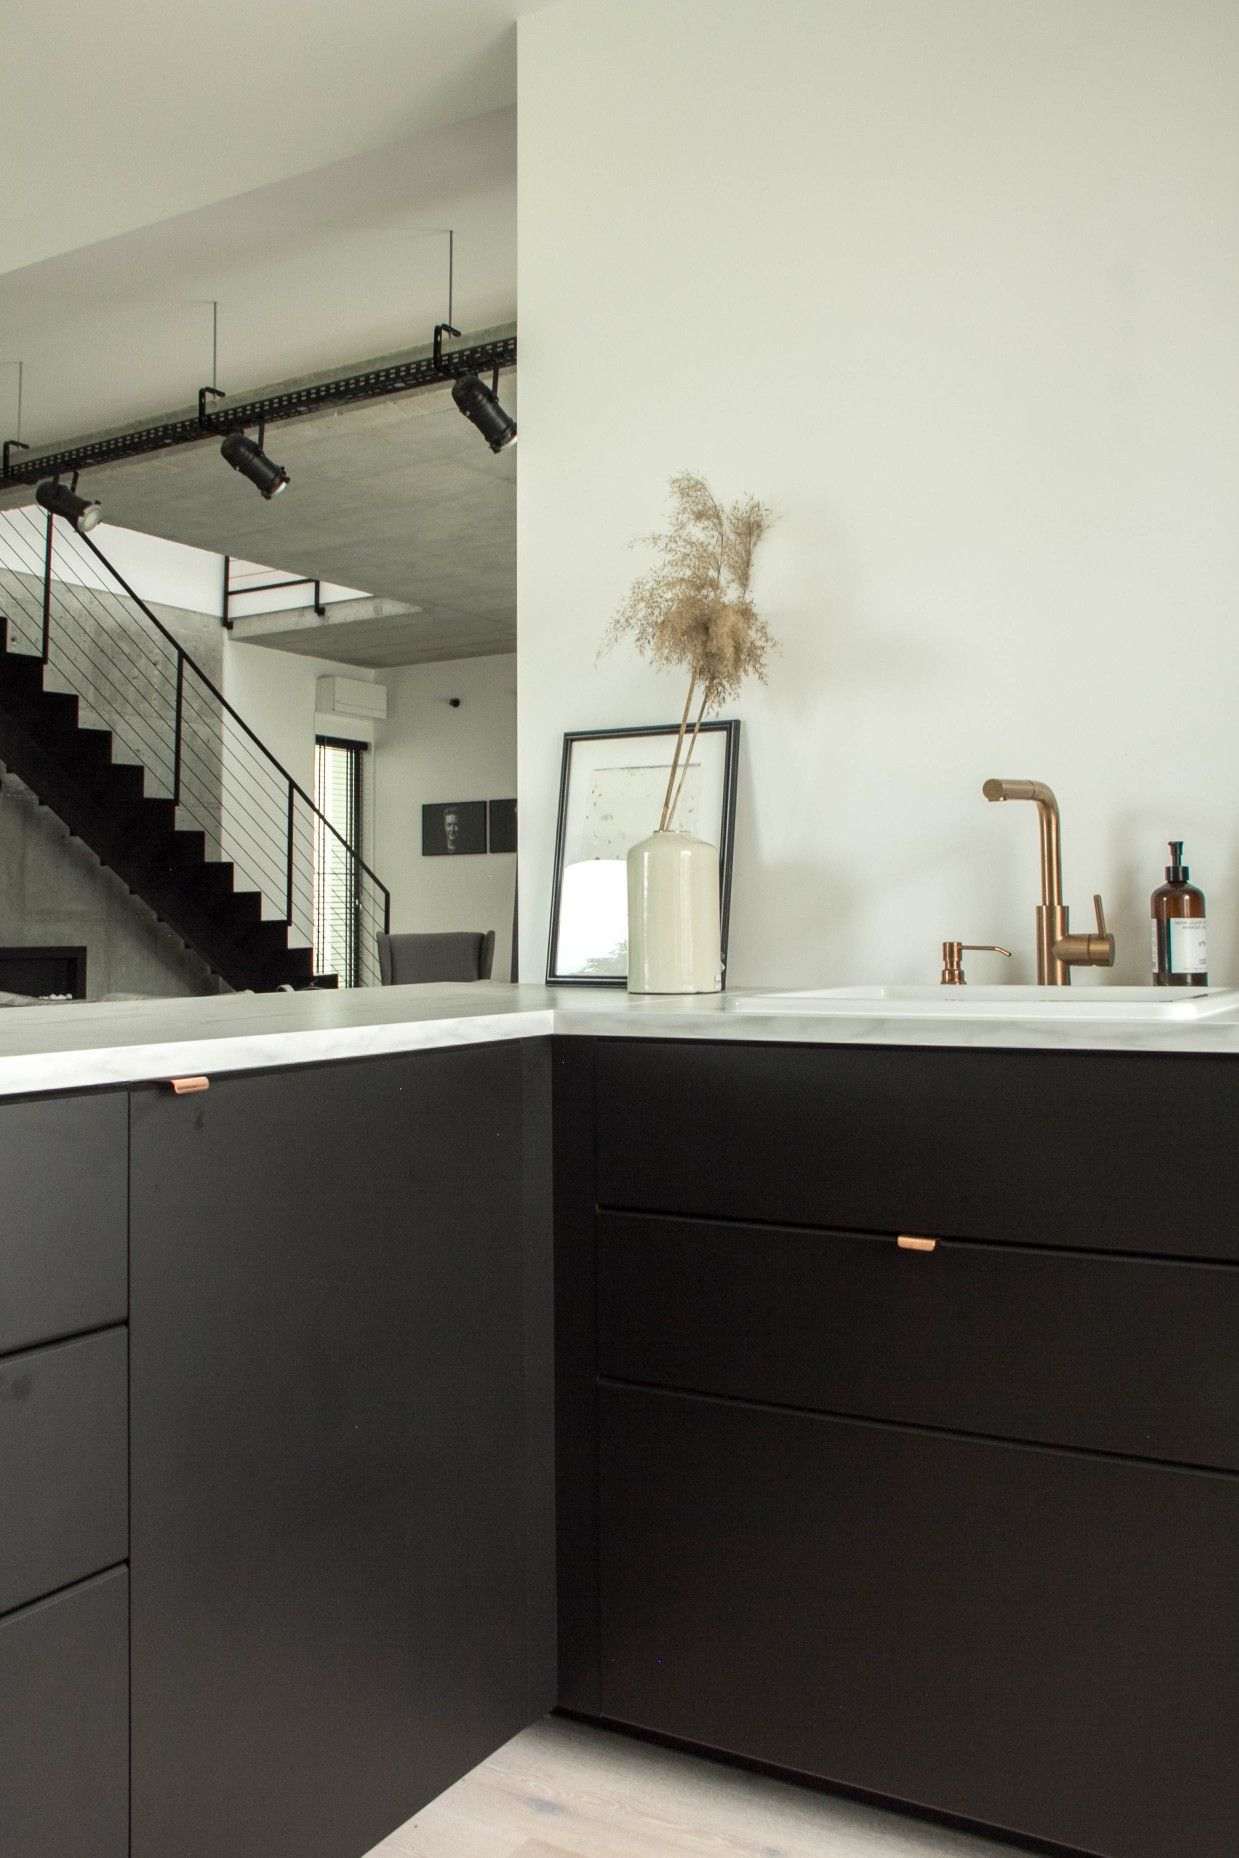 Minimalistic black kitchen in 2020 Black kitchens, Ikea